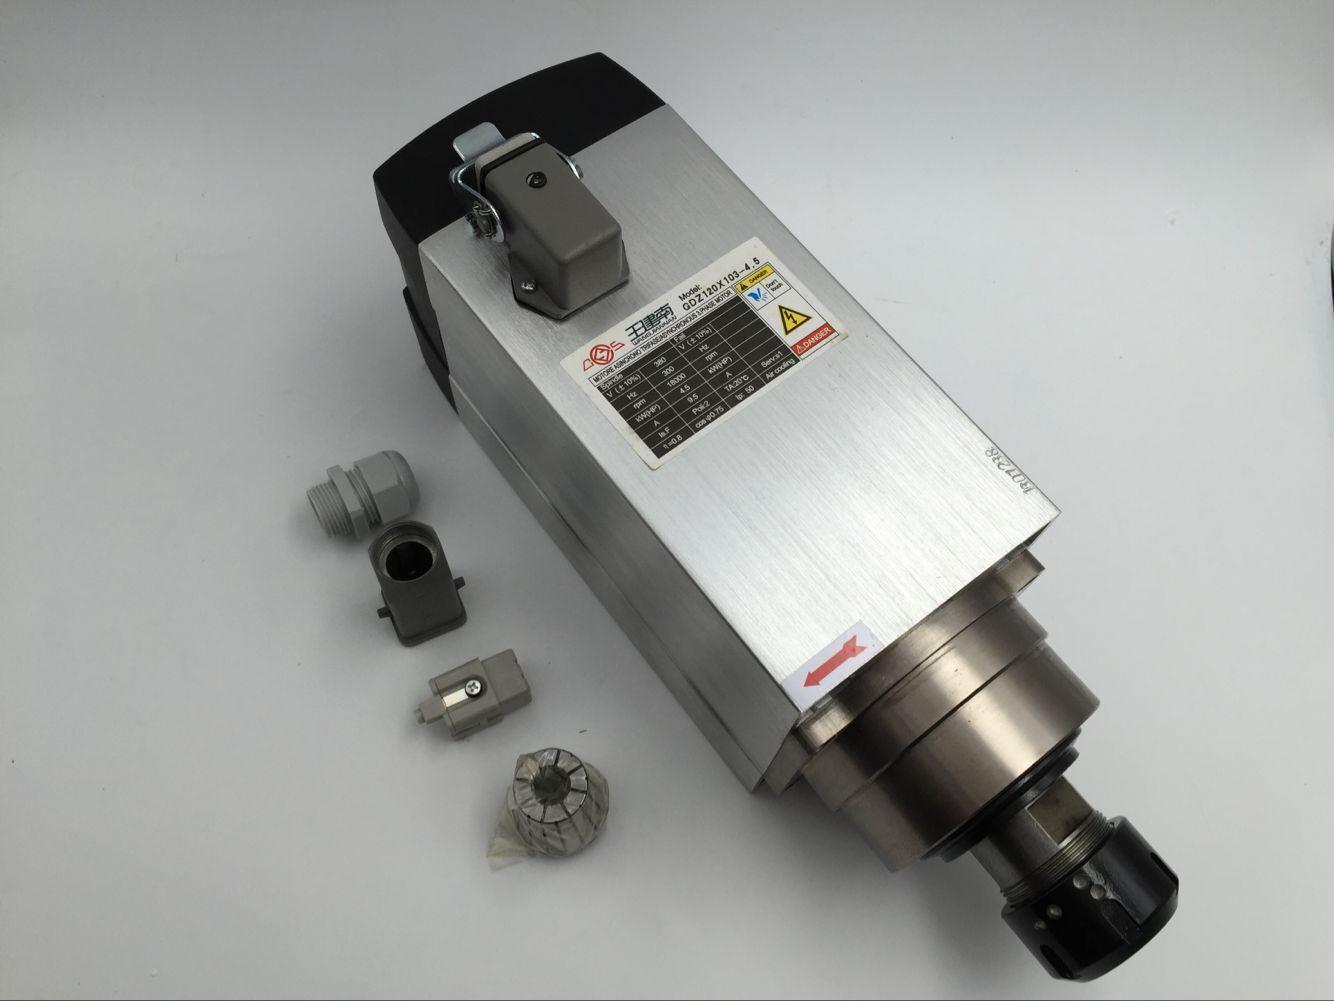 4.5KW 6HP ER32 380 V Spindel Motor Luftgekühlten 4 stücke Keramik Lager Hohe Präzision für CNC Gravur maschine Router holzbearbeitung